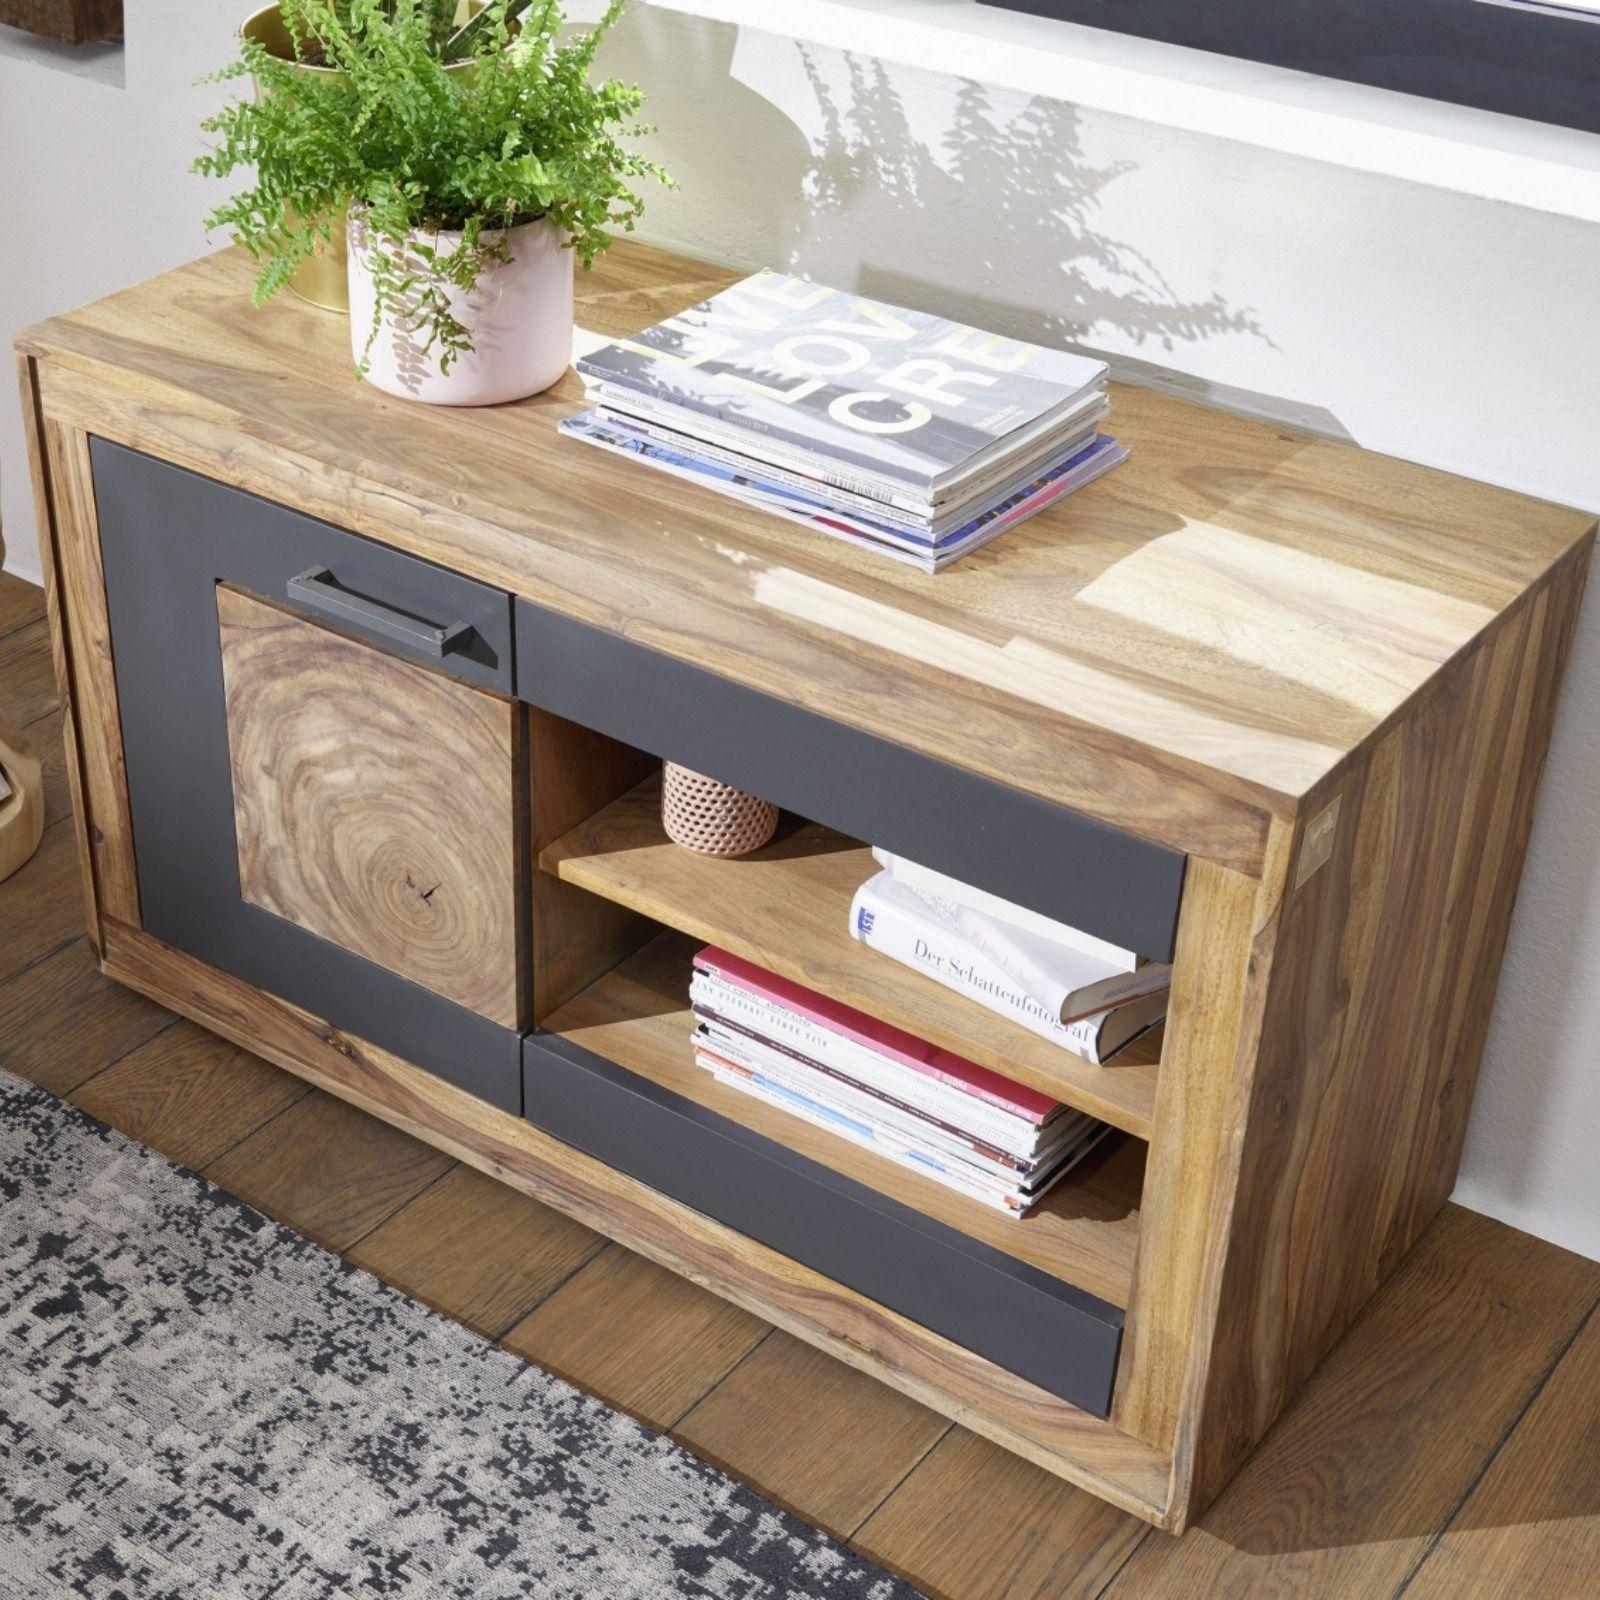 Turin Holzdesign Modernes Design Home Interior